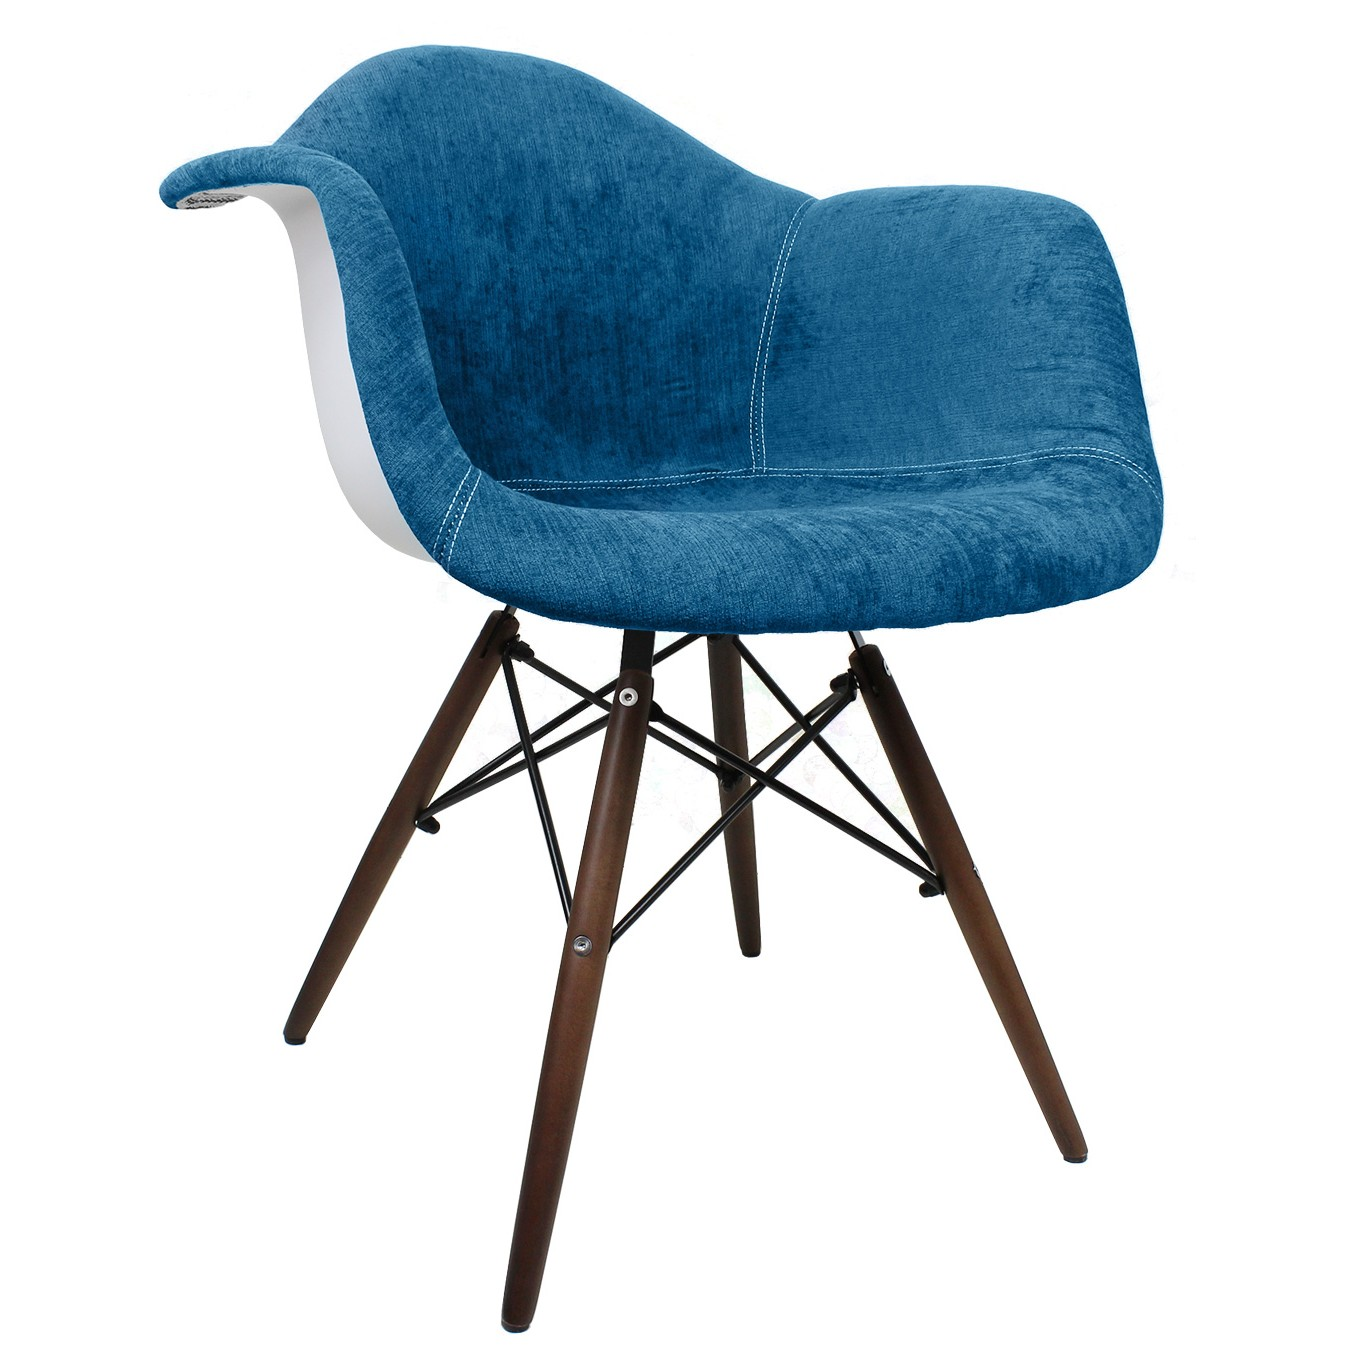 Aqua Blue Velvet Fabric Eames Style Accent Arm Chair